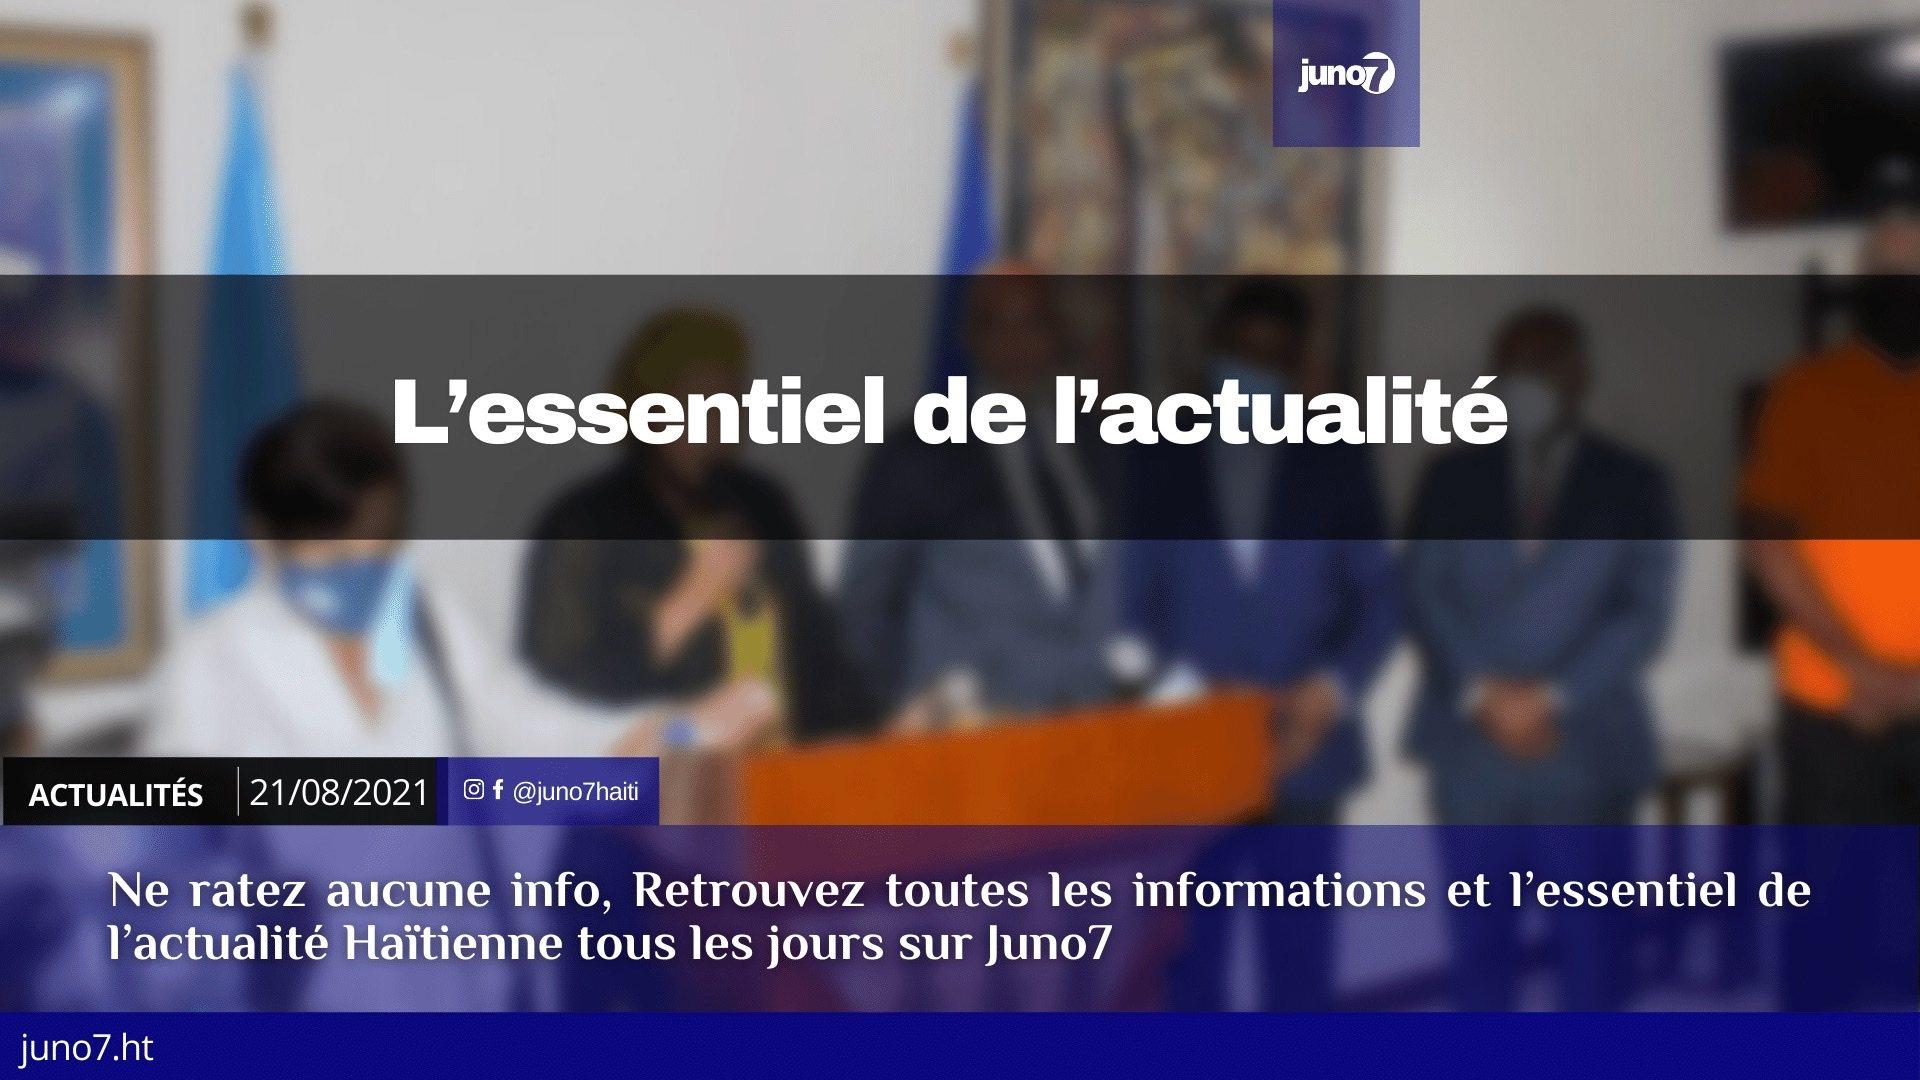 Haïti: l'essentiel de l'actualité du samedi 21 août 2021